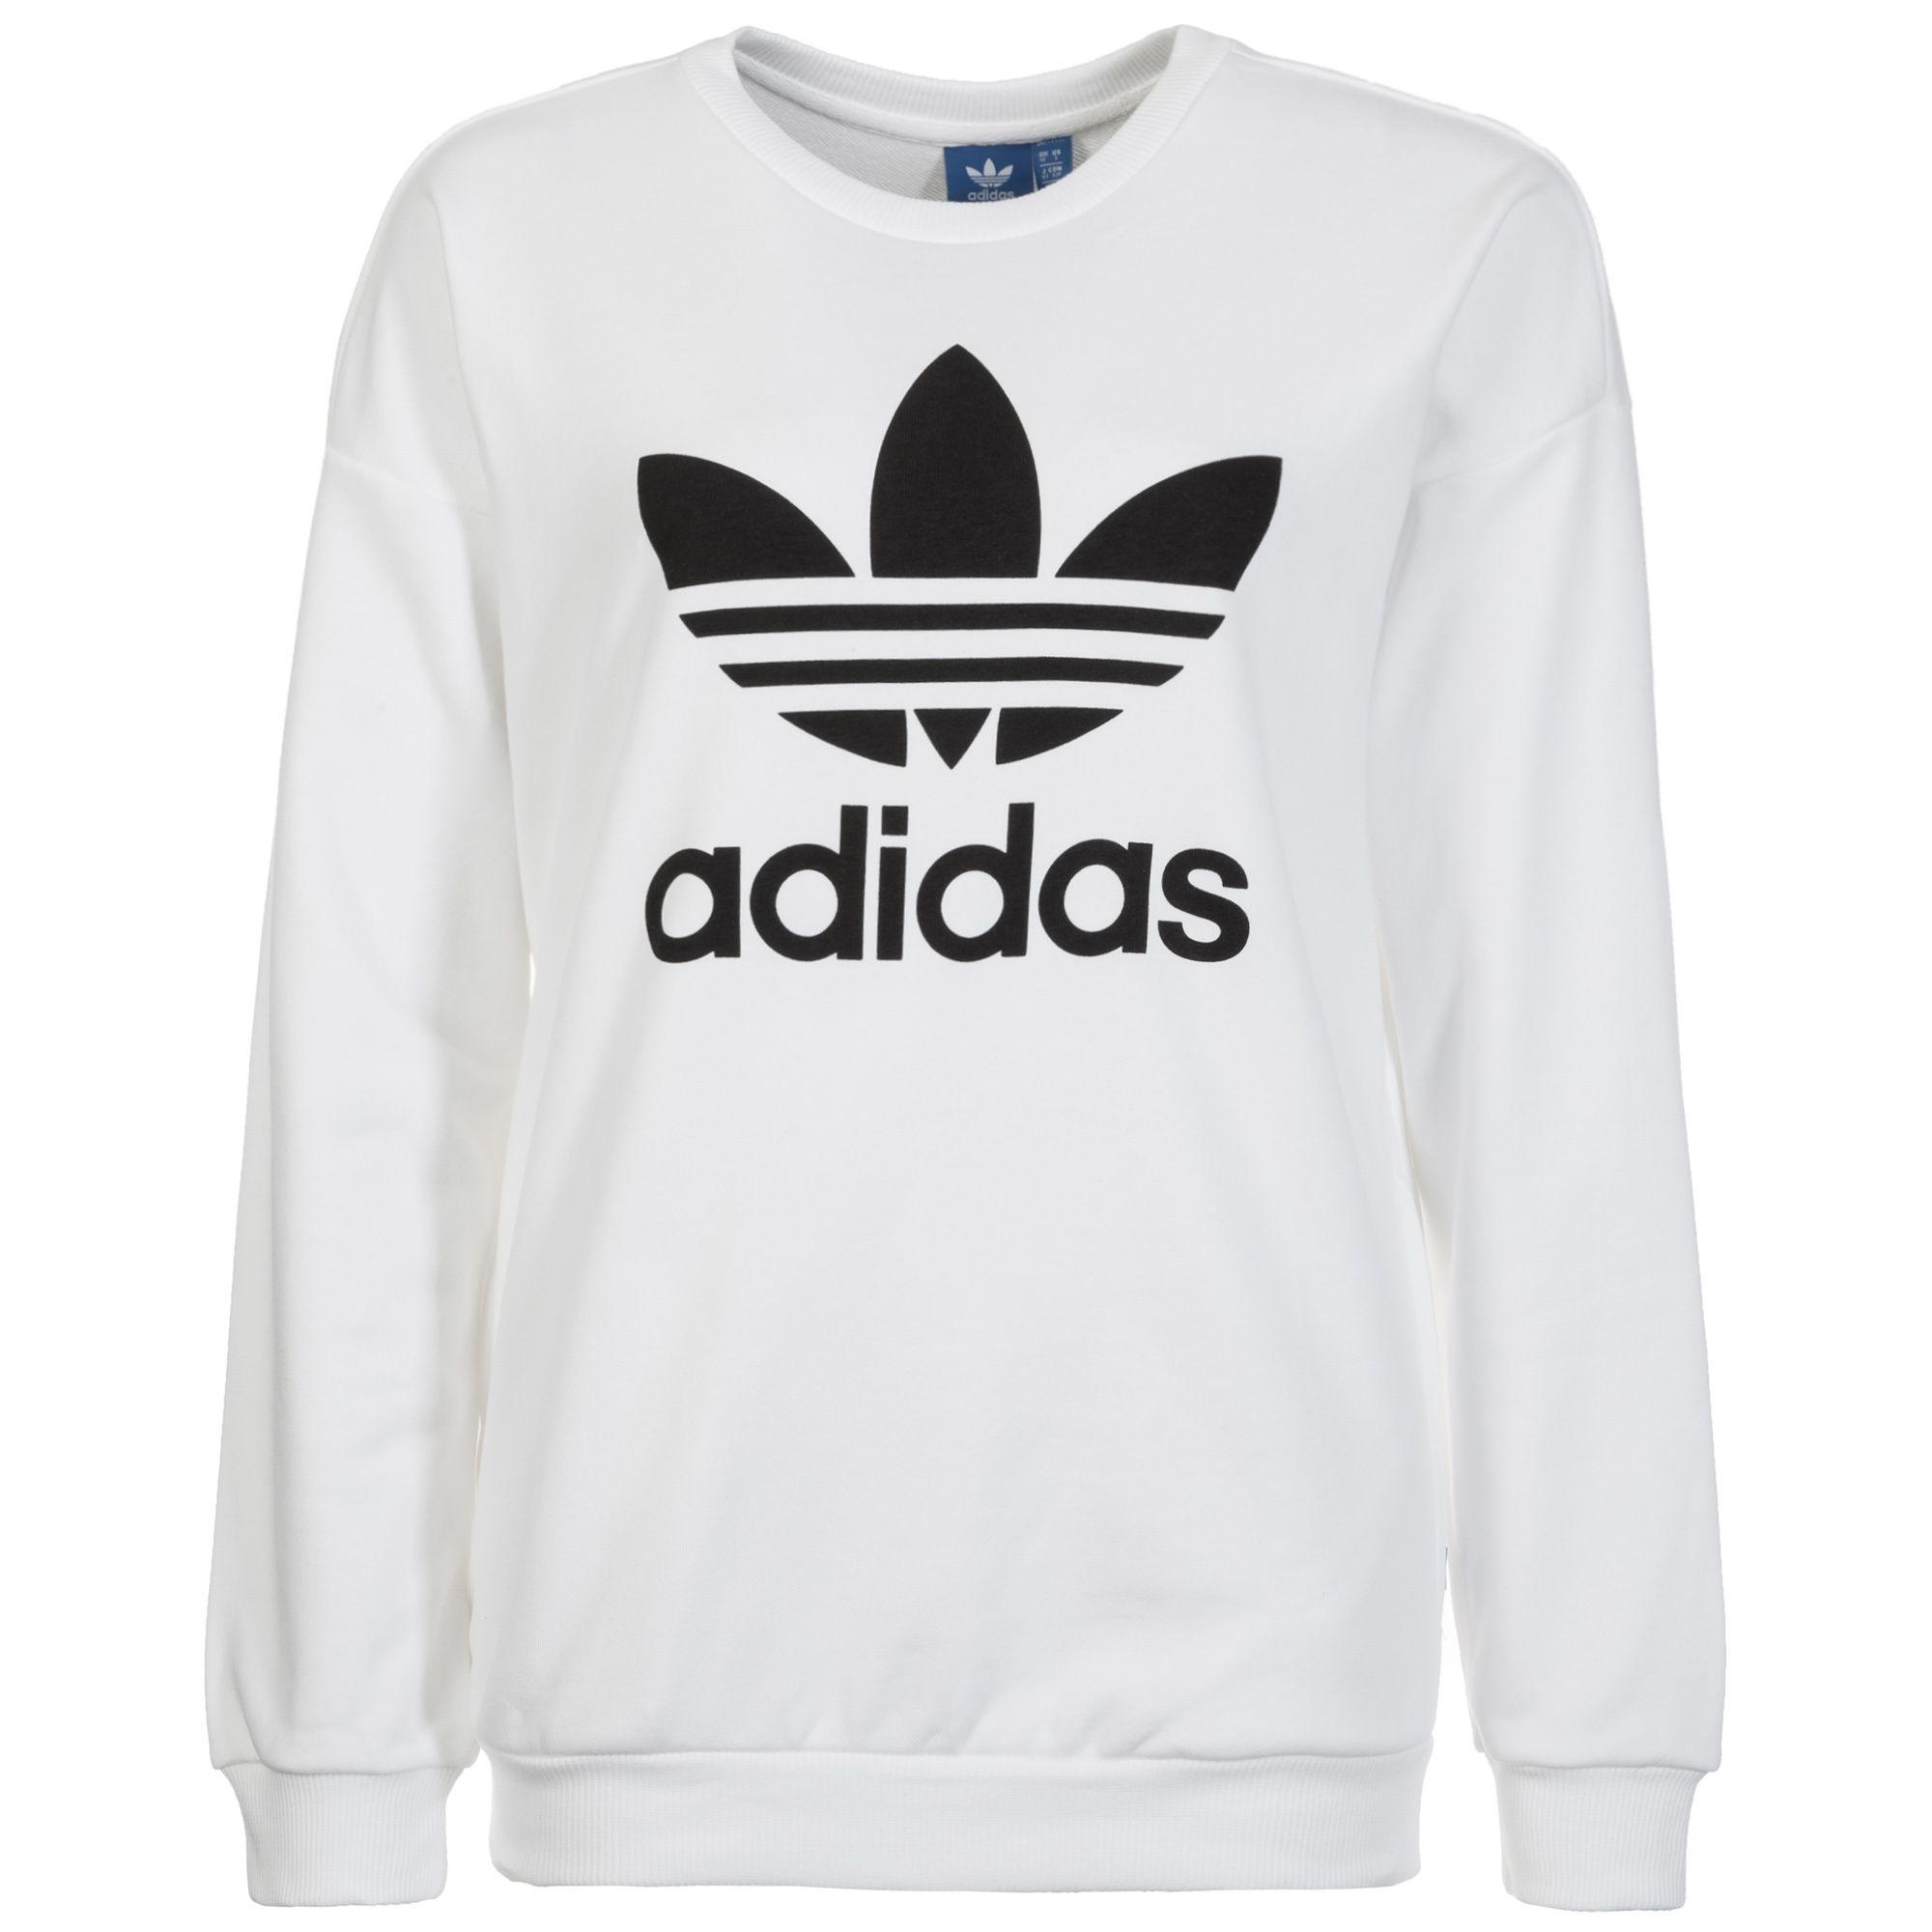 ADIDAS ORIGINALS adidas Originals Trefoil Sweatshirt Damen